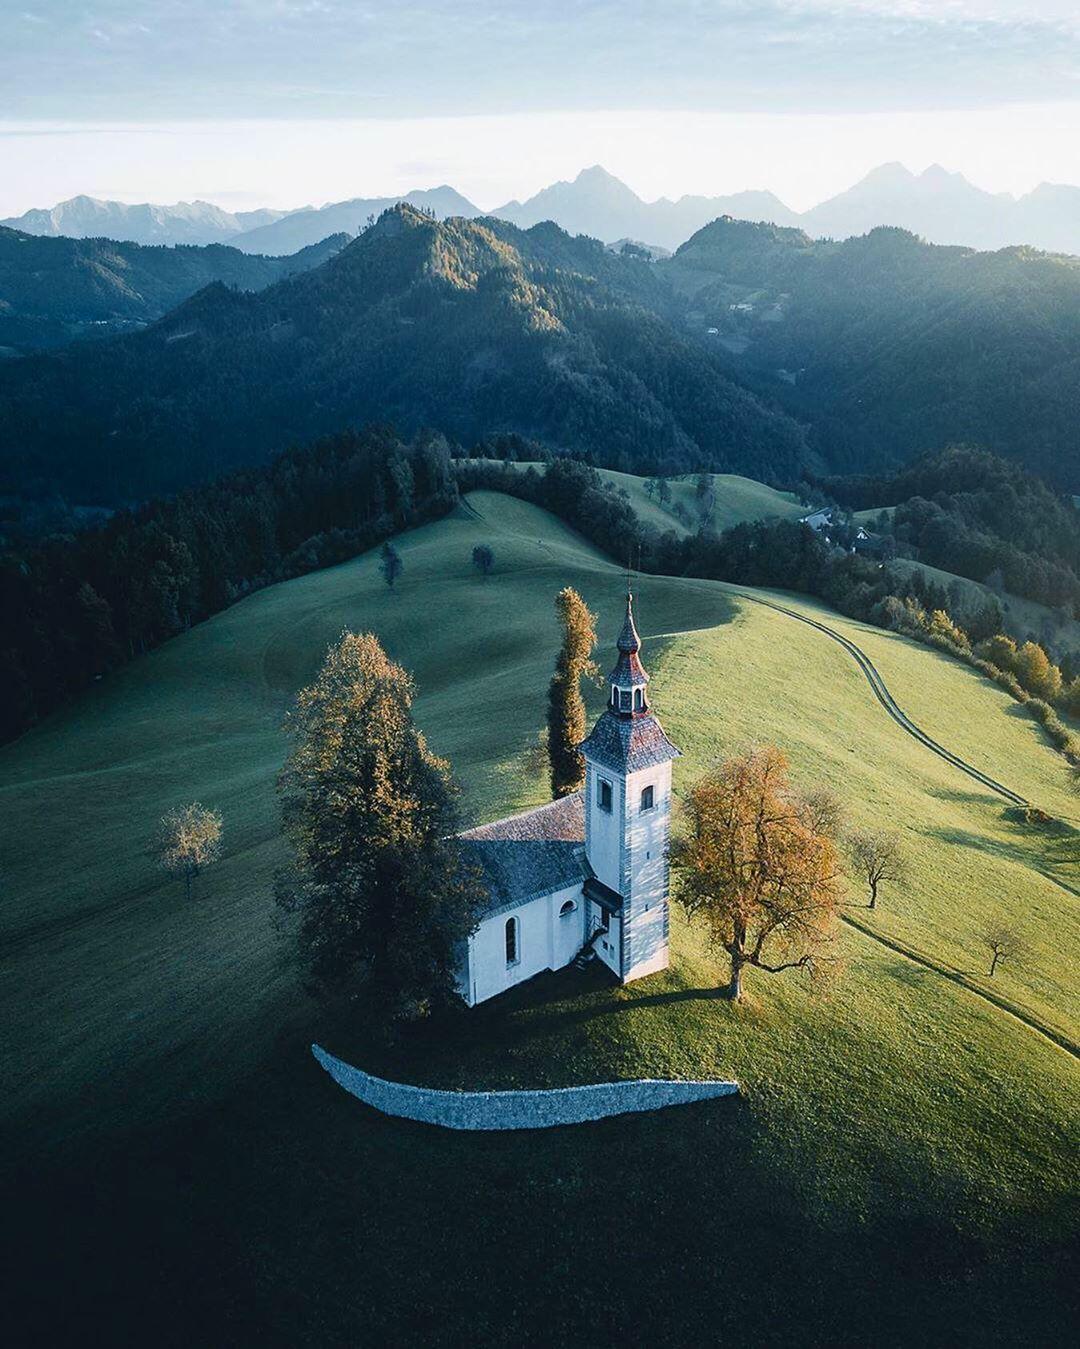 Sveti Tomaz Skofja Loka Slovenia 🇸🇮 📍 Cc : @manueldietrichphotography #slovenia #europe Sha